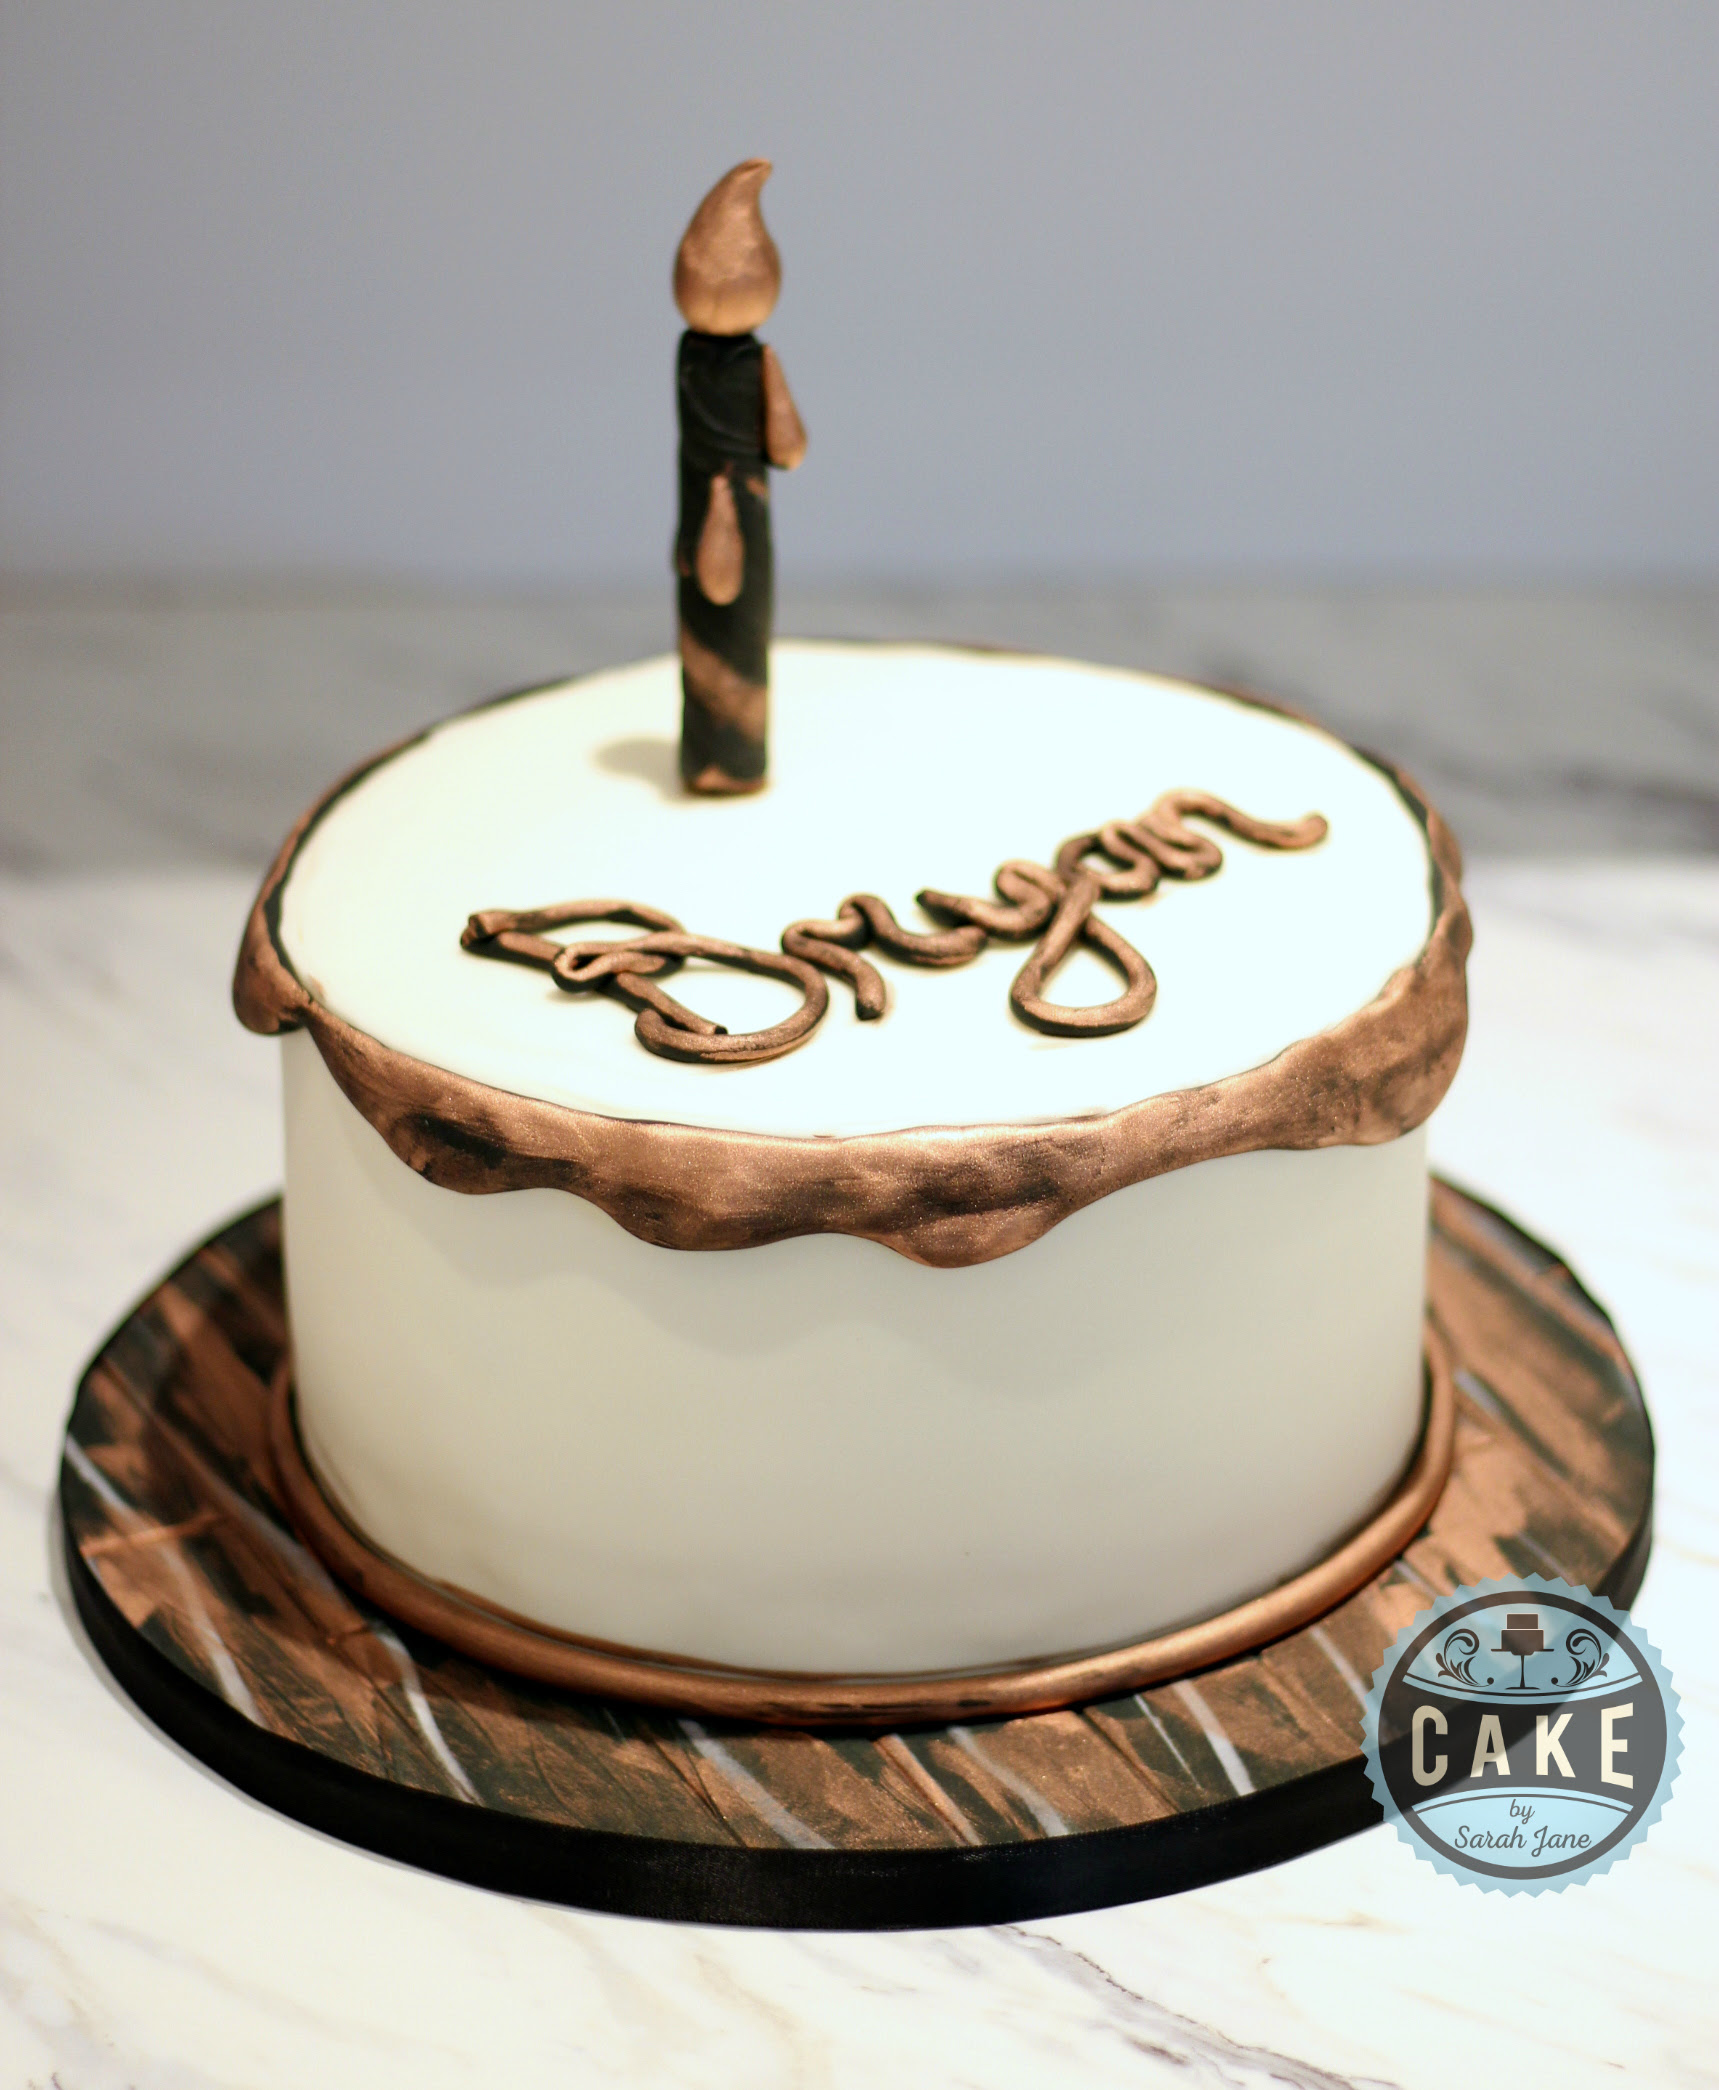 Happy Birthday Bryan Cake By Sarah Jane